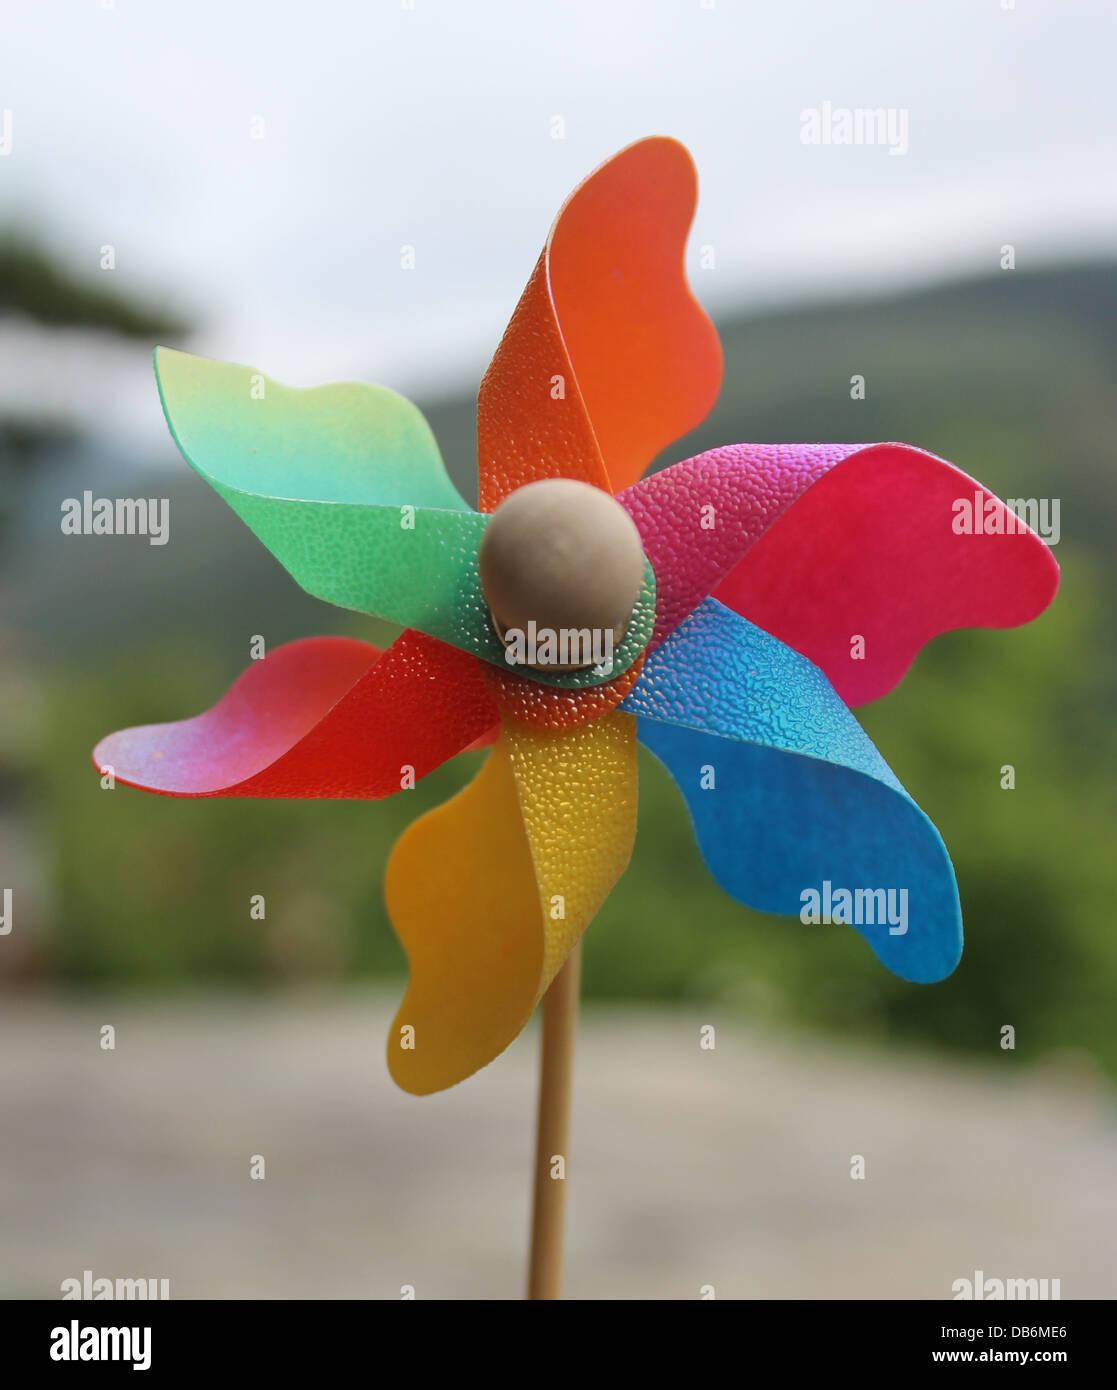 a beautiful and multi-colored pinwheel - Stock Image